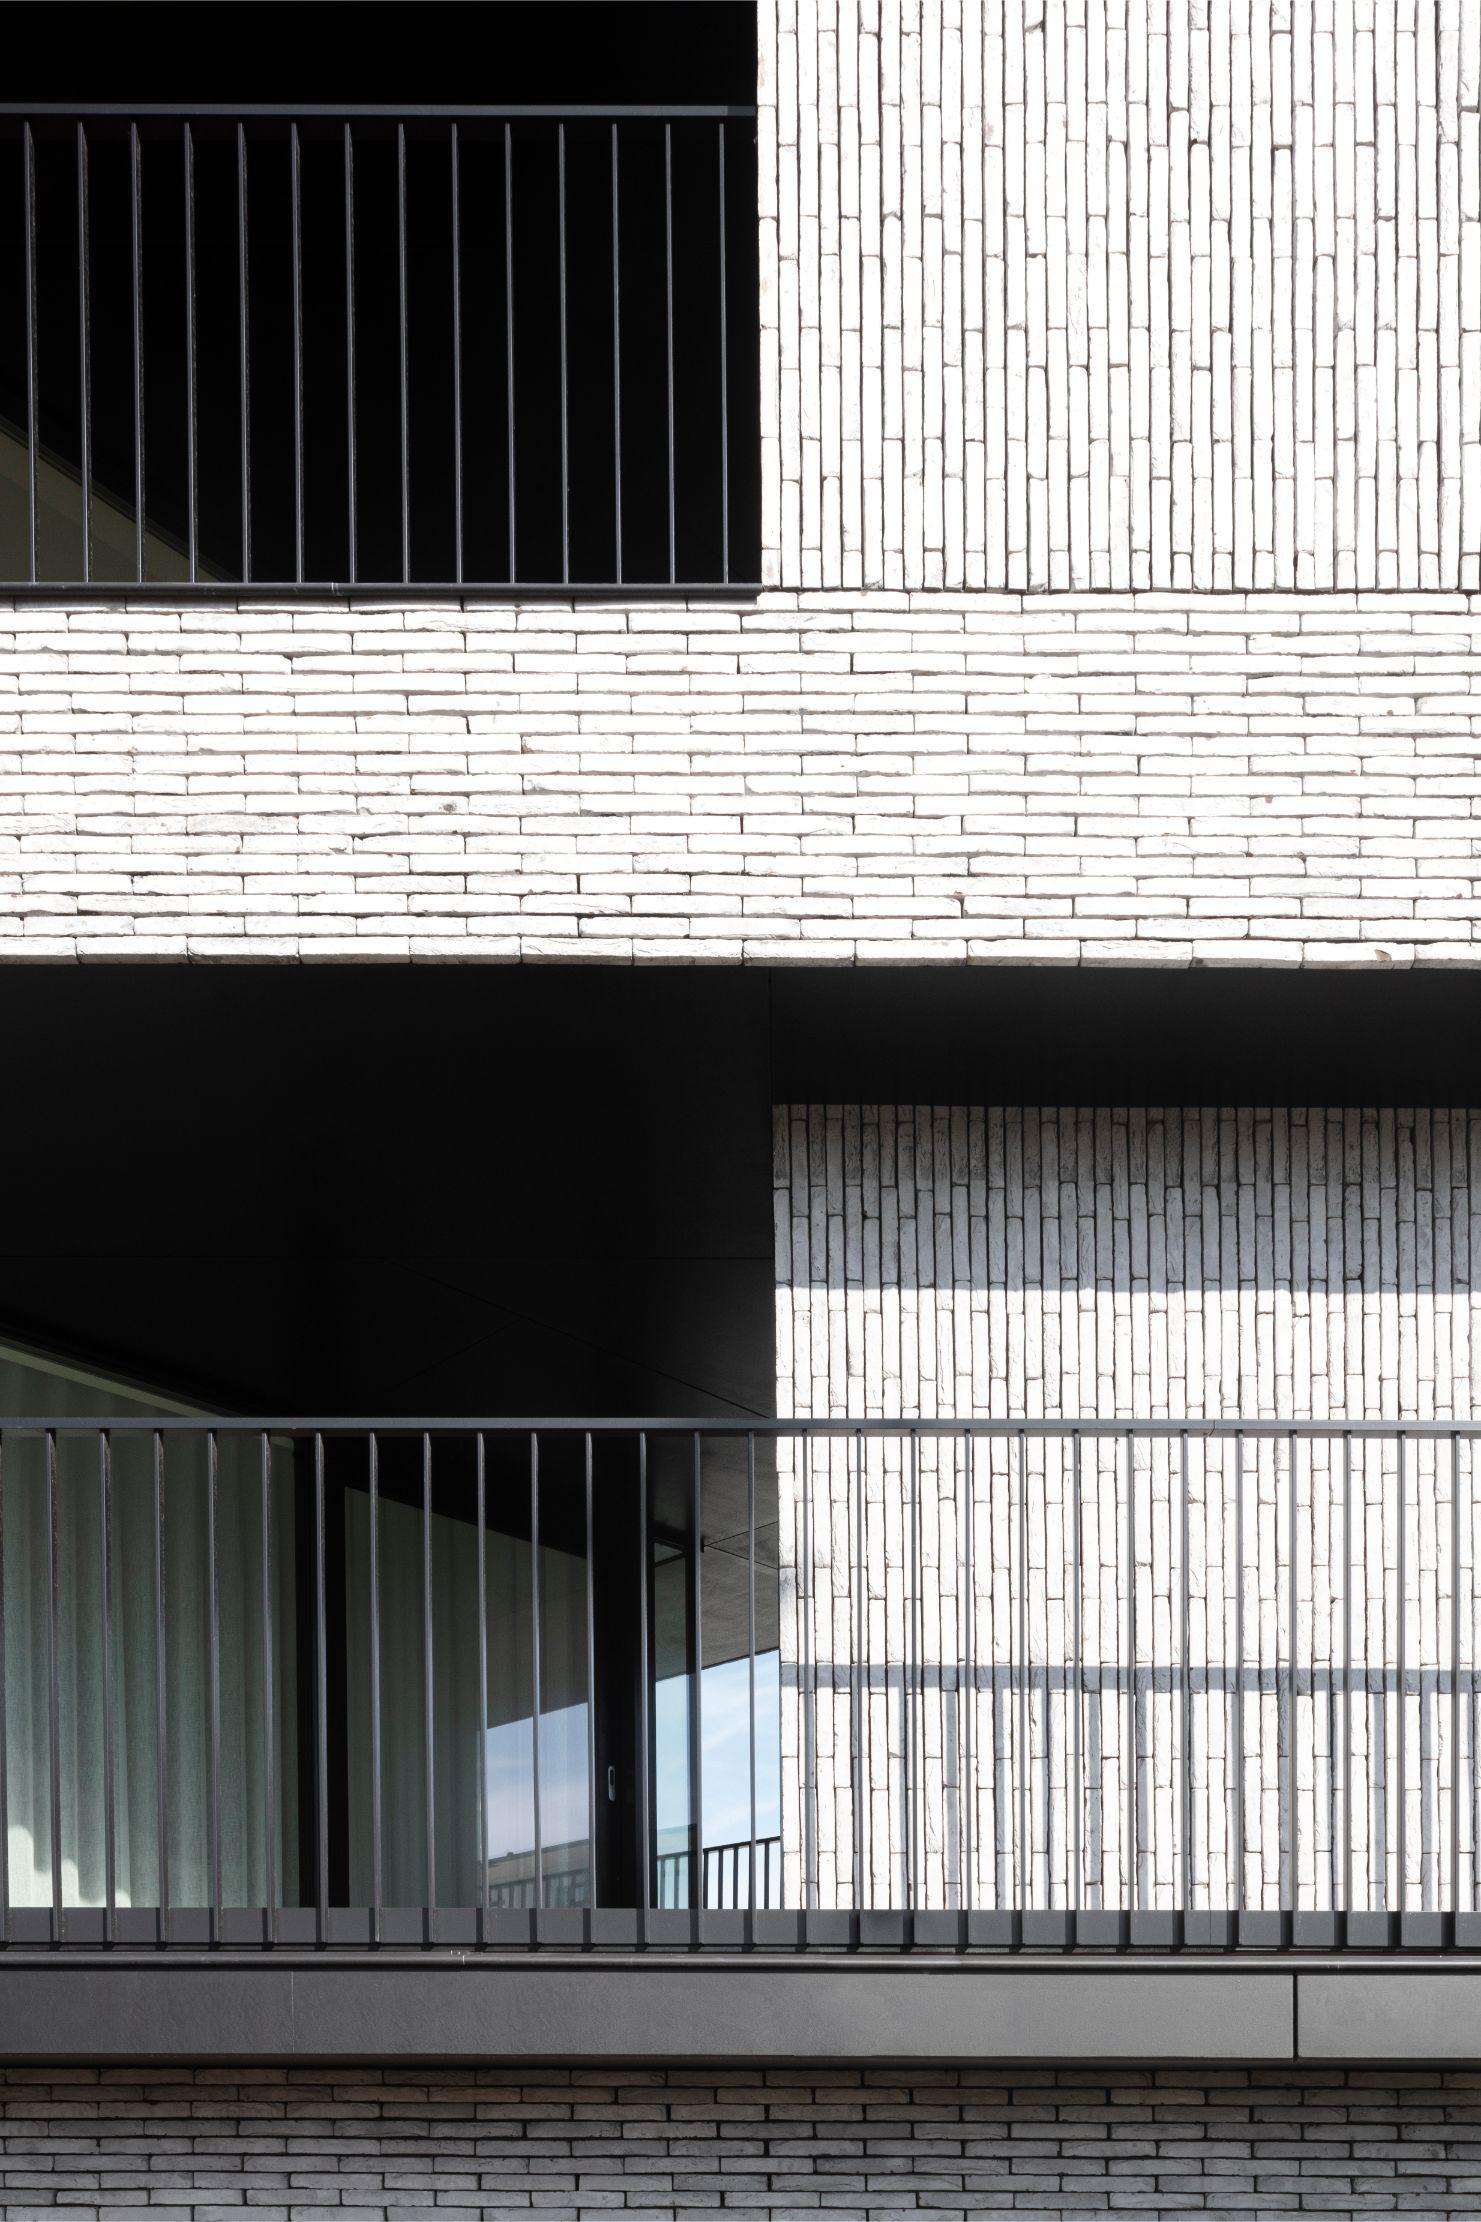 Pierre Paulin - Rietveldprojects - Sint-Idesbald - Tvdv8